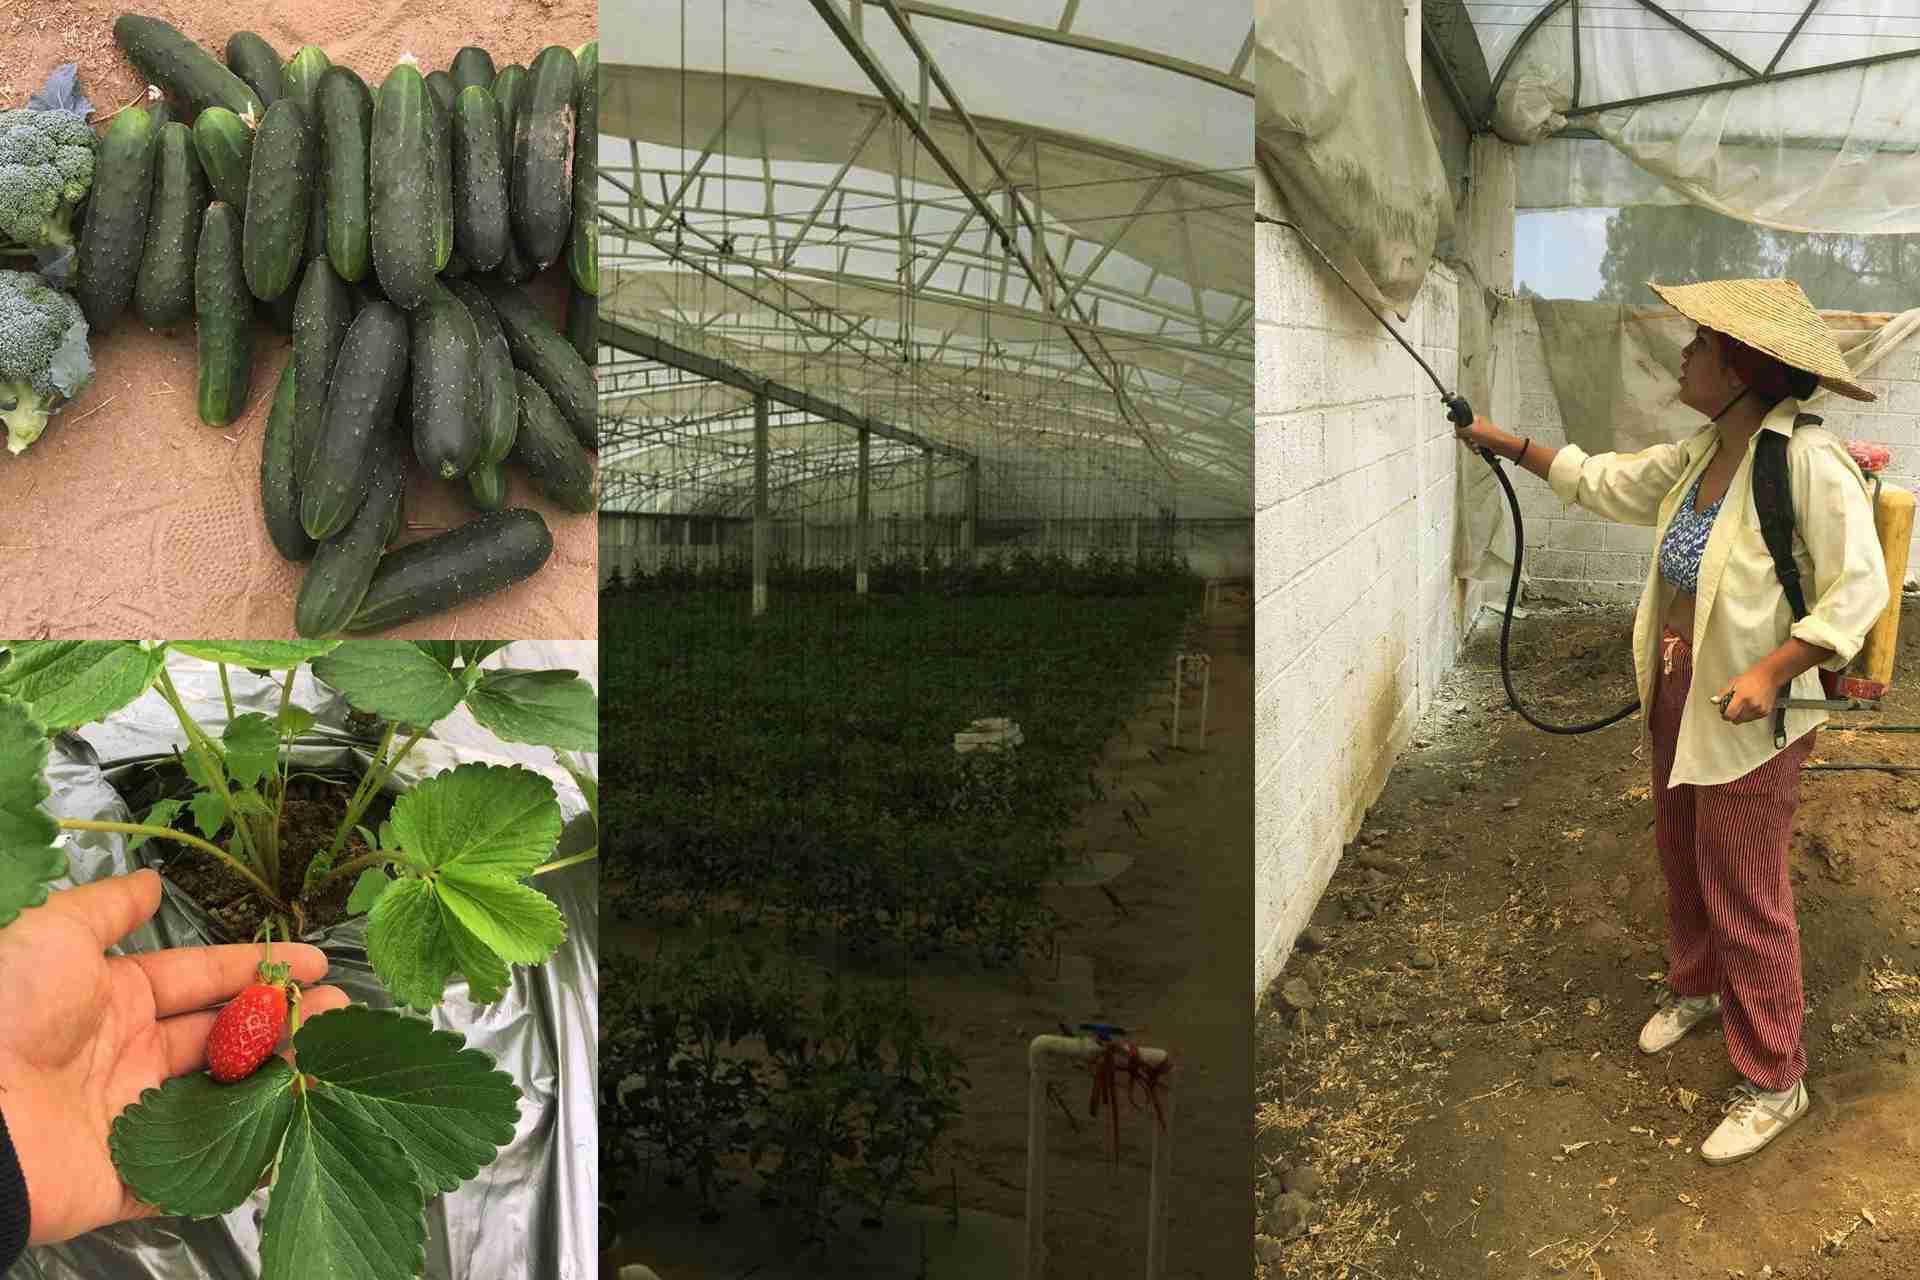 Invernadero-Tlaxcala-Ecología-Verde-Pepino-Brócoli-Cuarentena